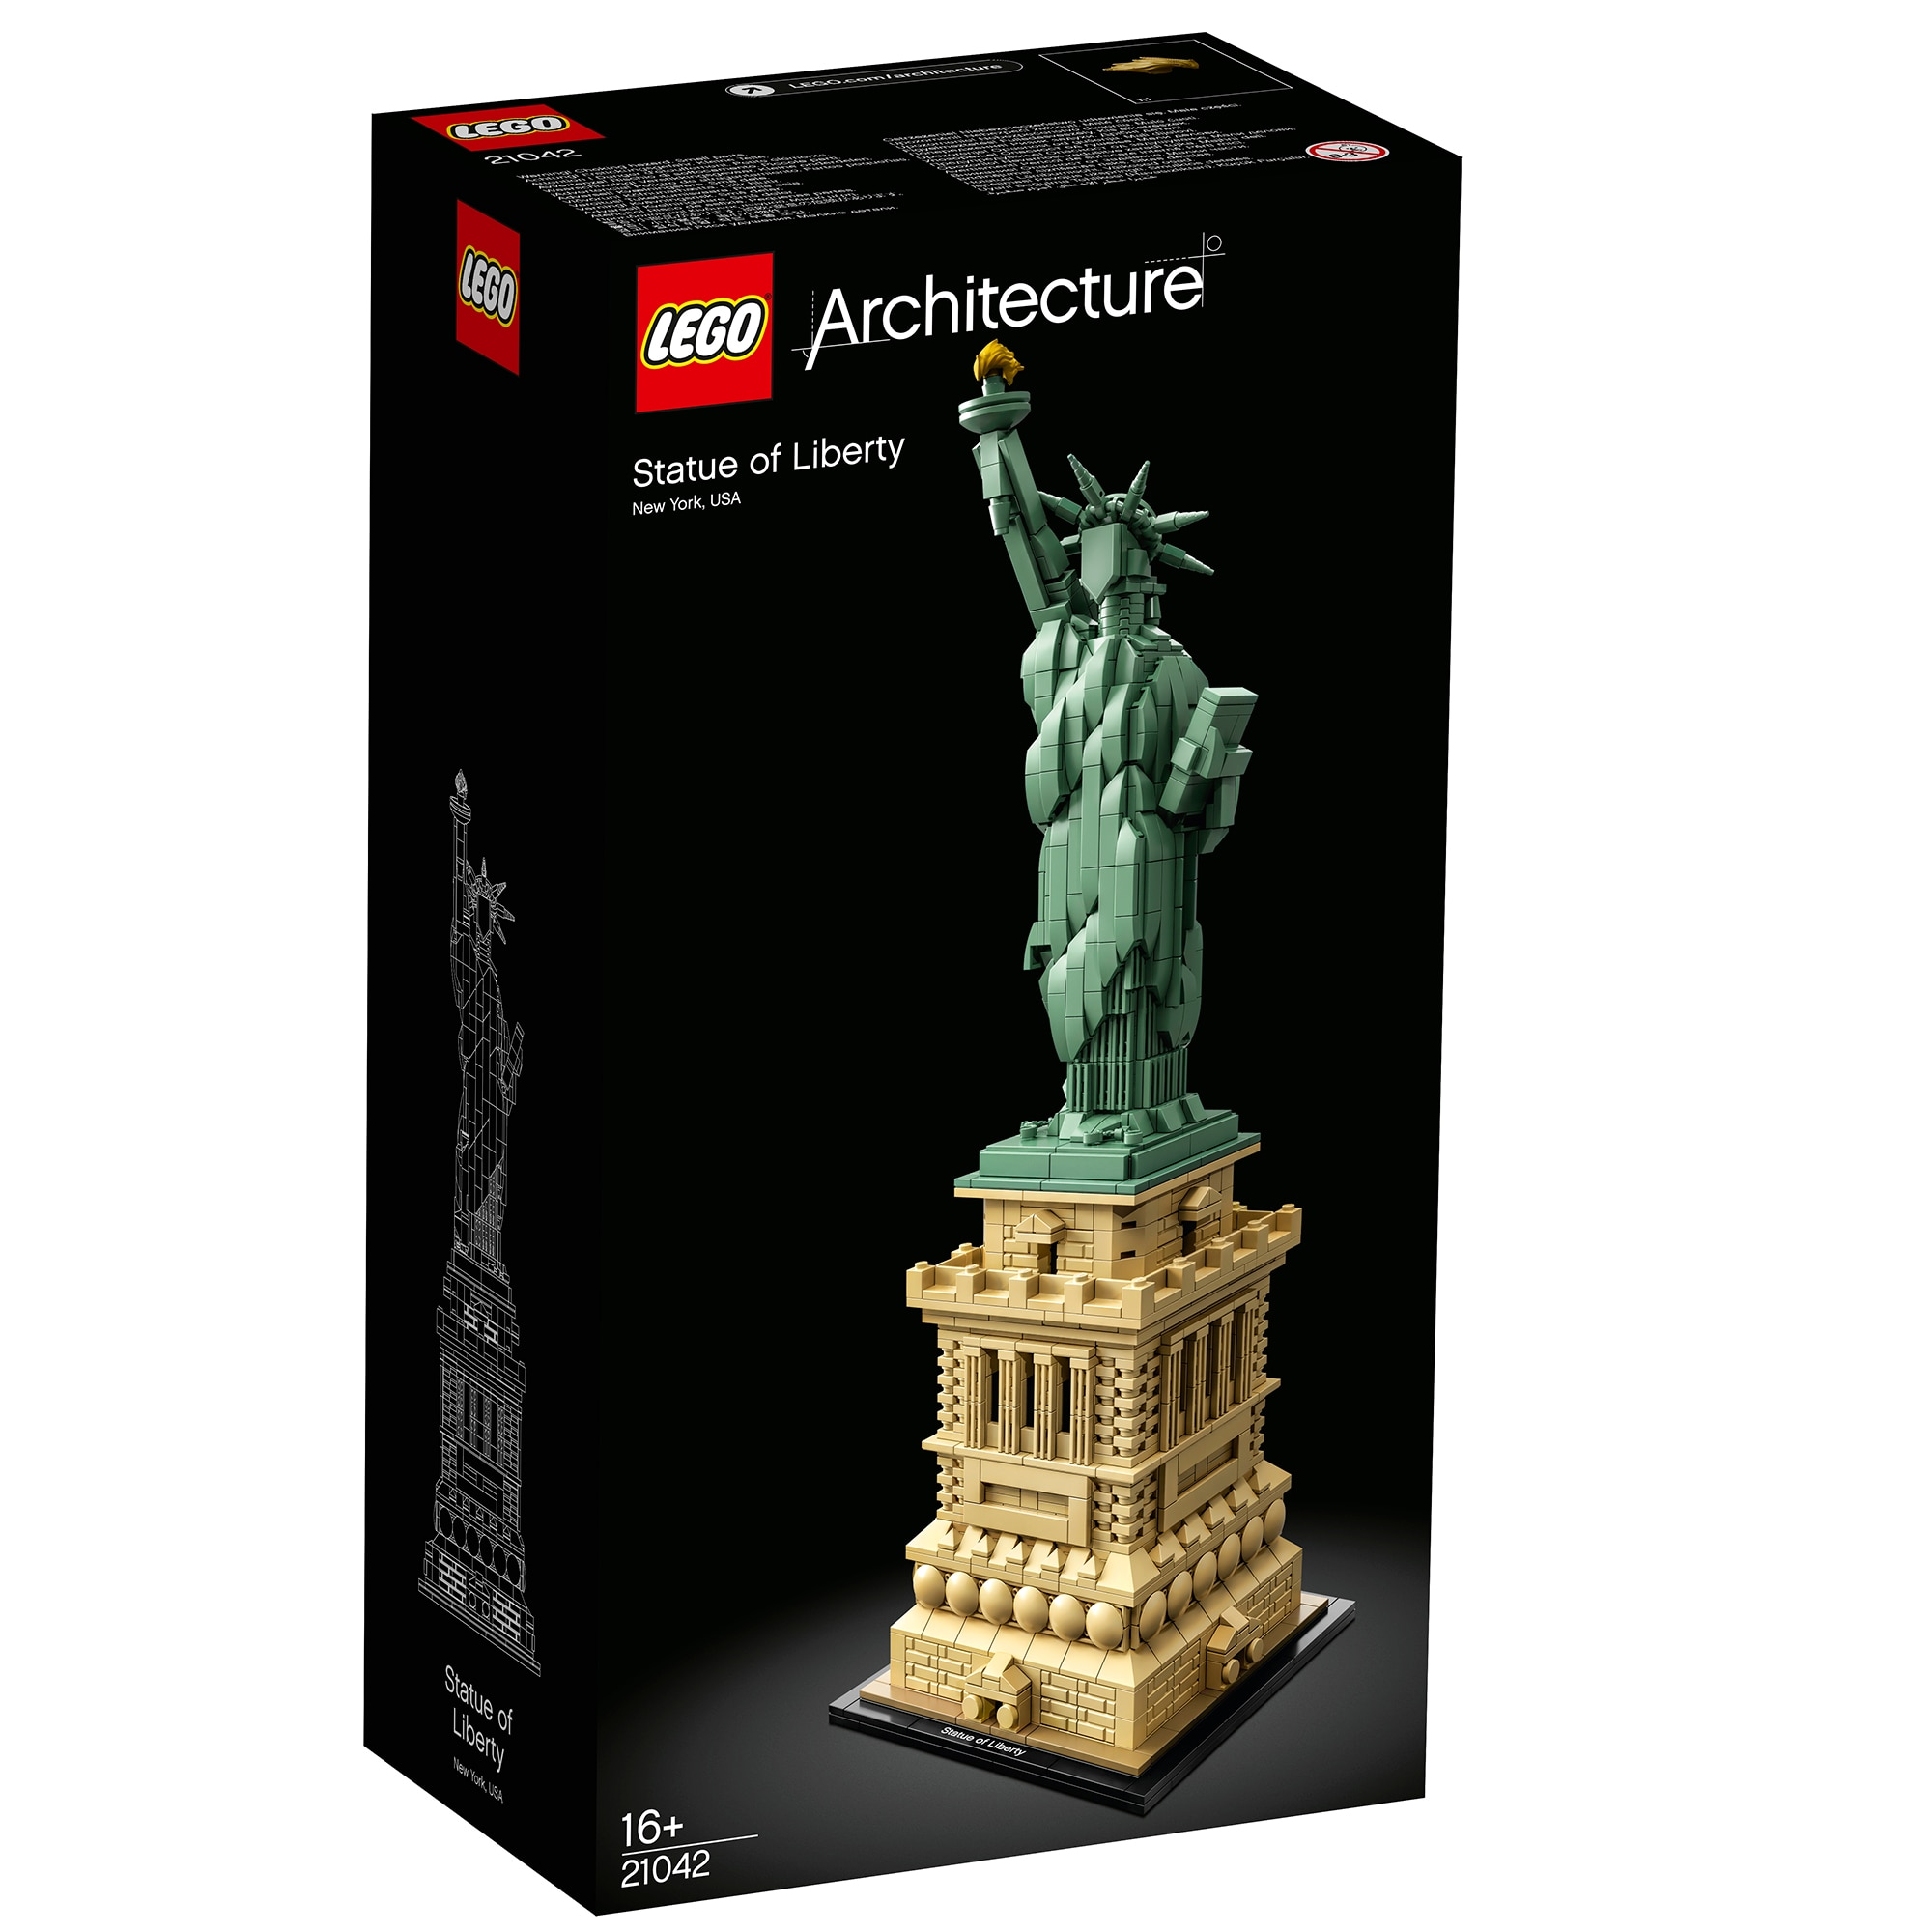 Fotografie LEGO Architecture - Statuia Libertatii 21042, 1685 piese